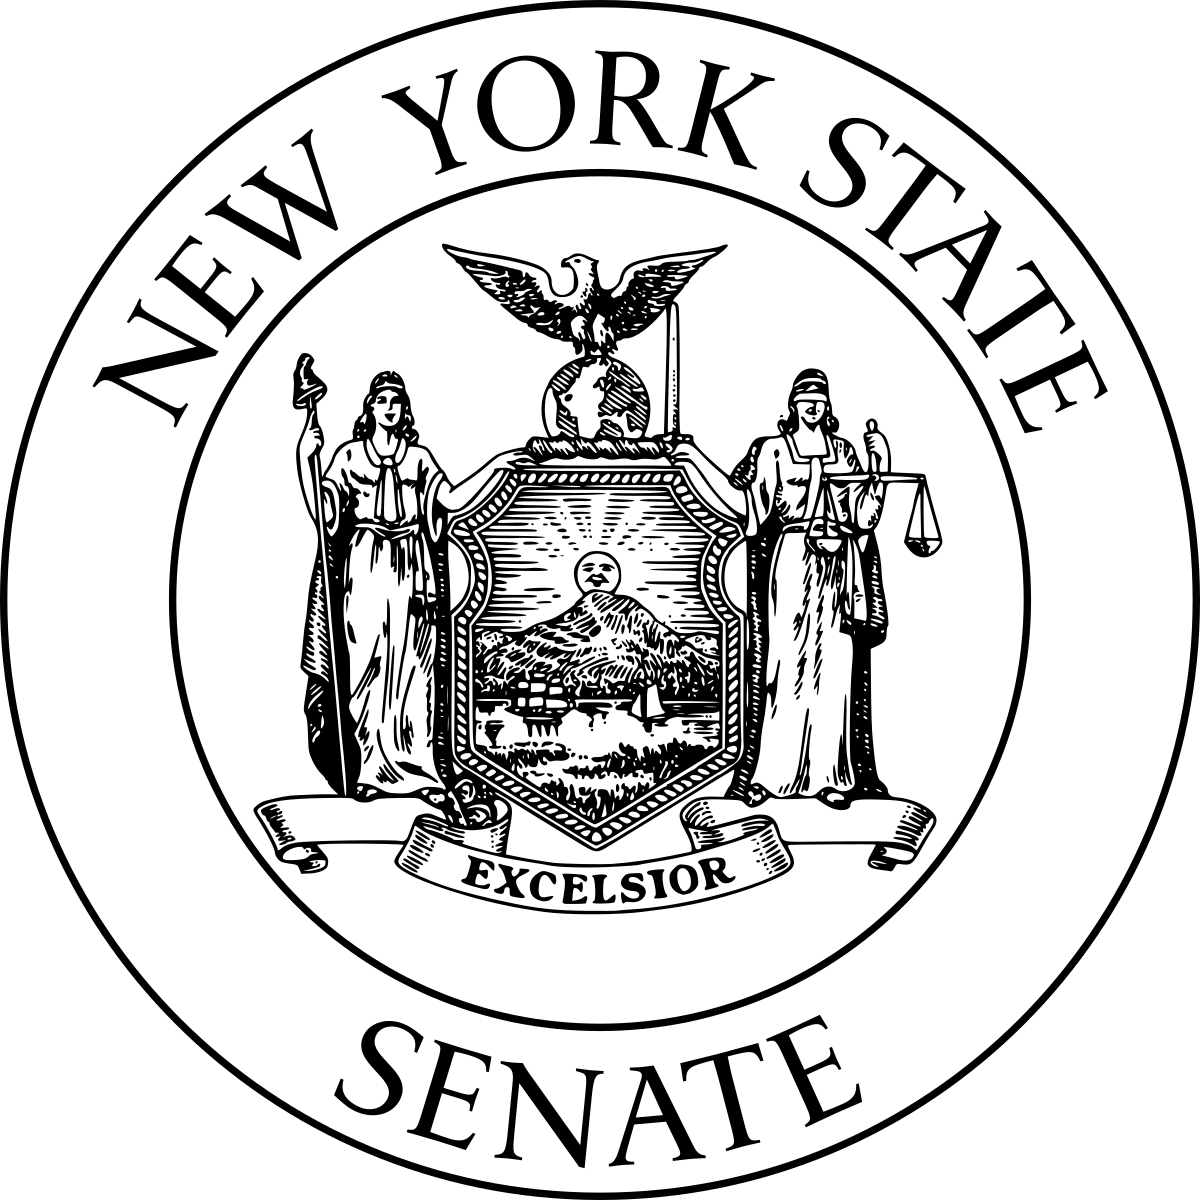 Democracy clipart turncoat. New york state senate